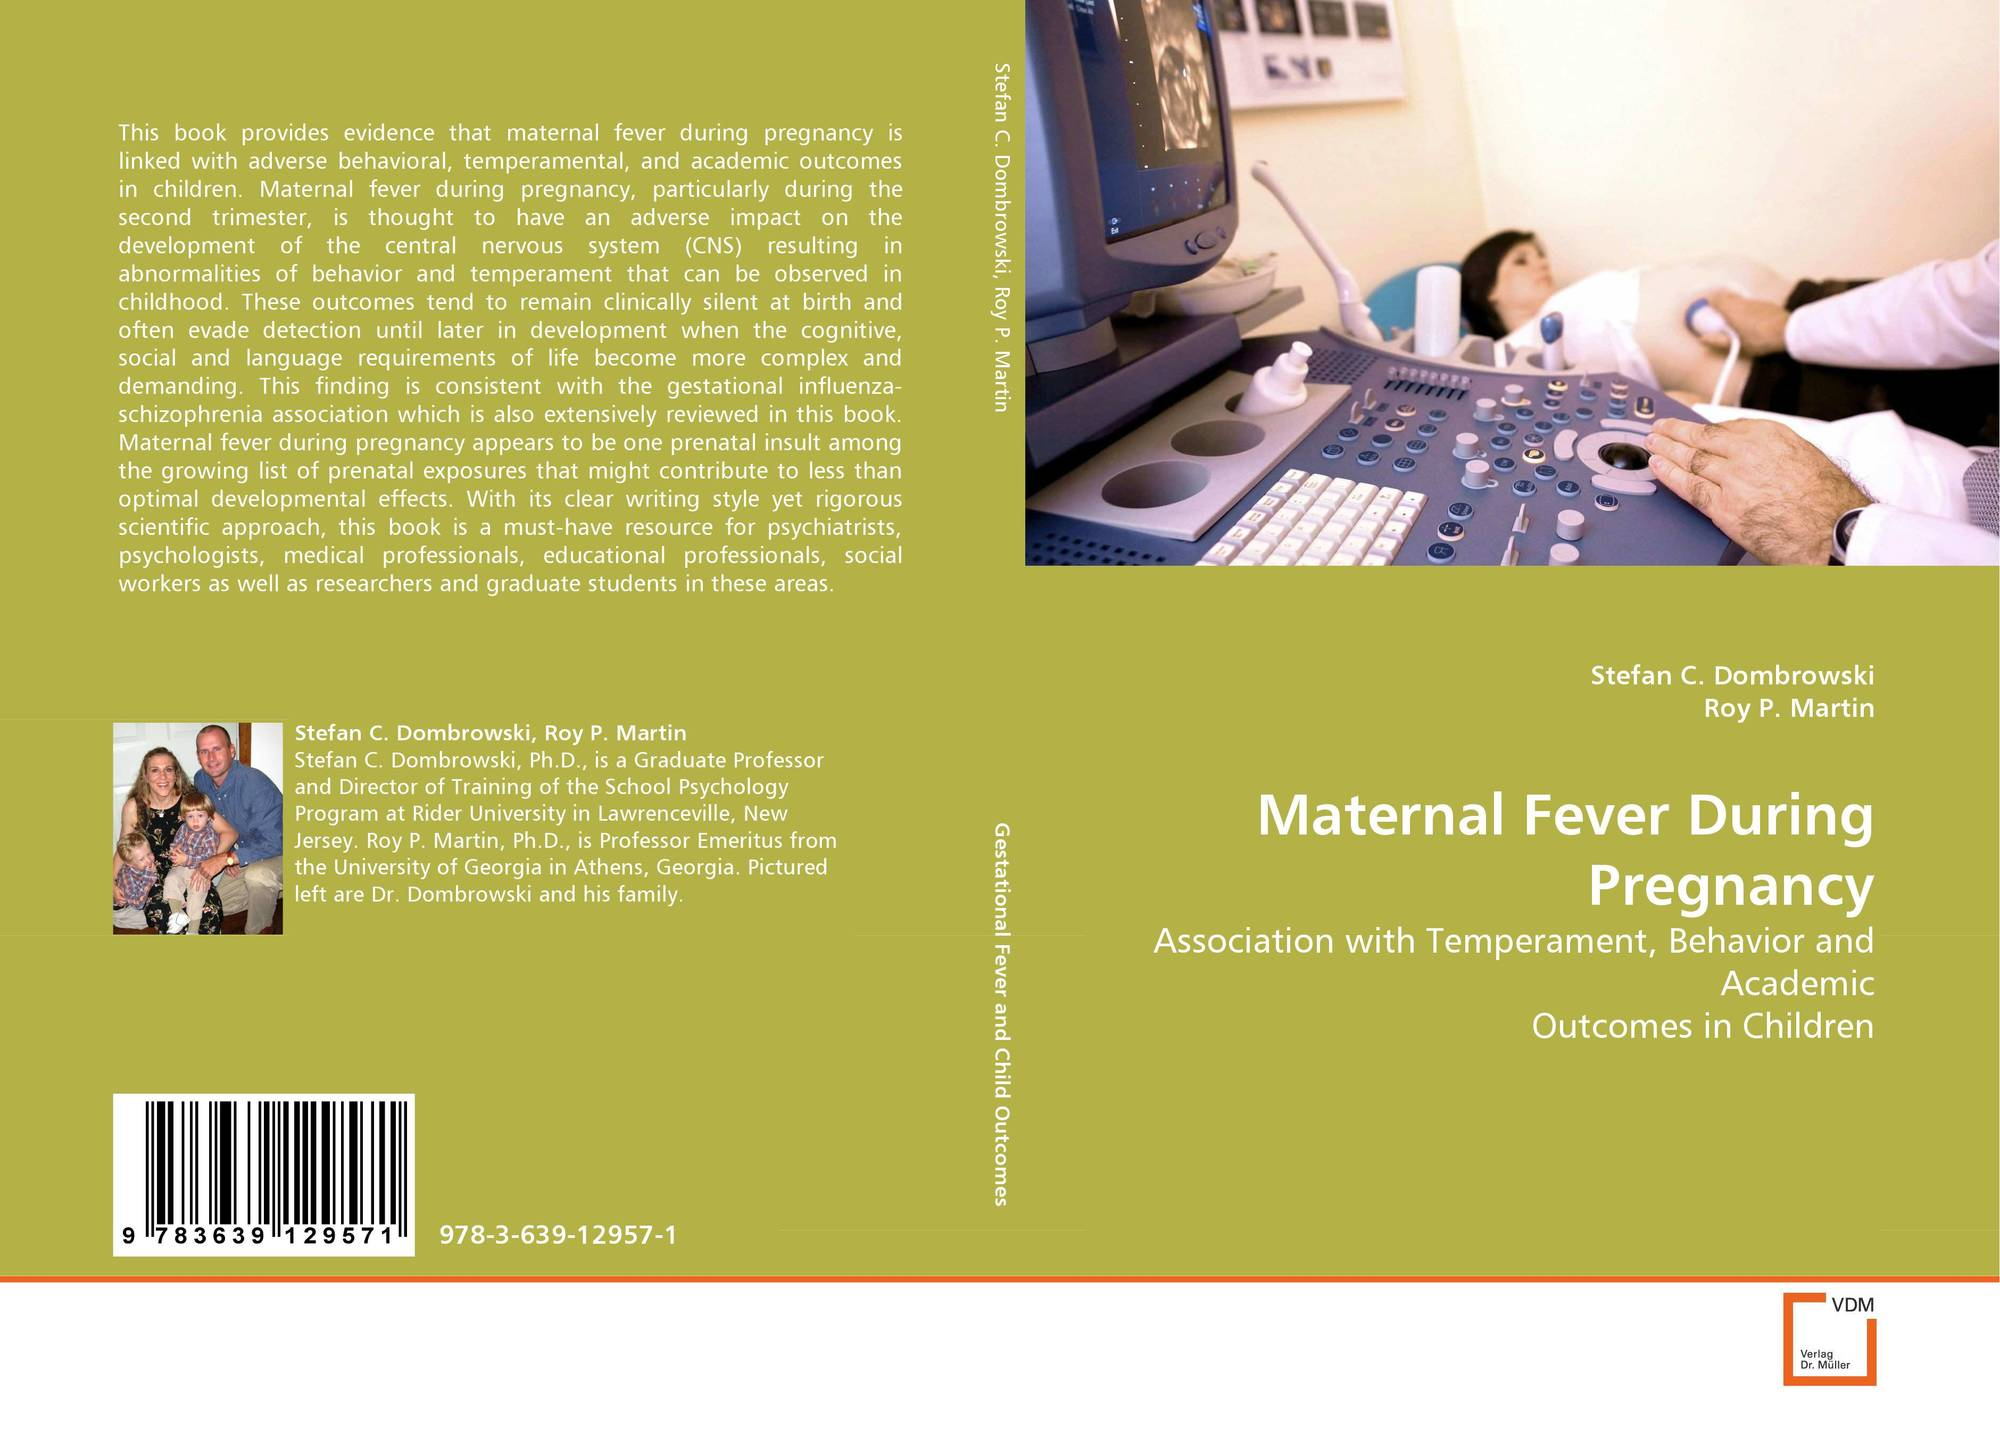 Maternal Fever During Pregnancy, 978-3-639-12957-1